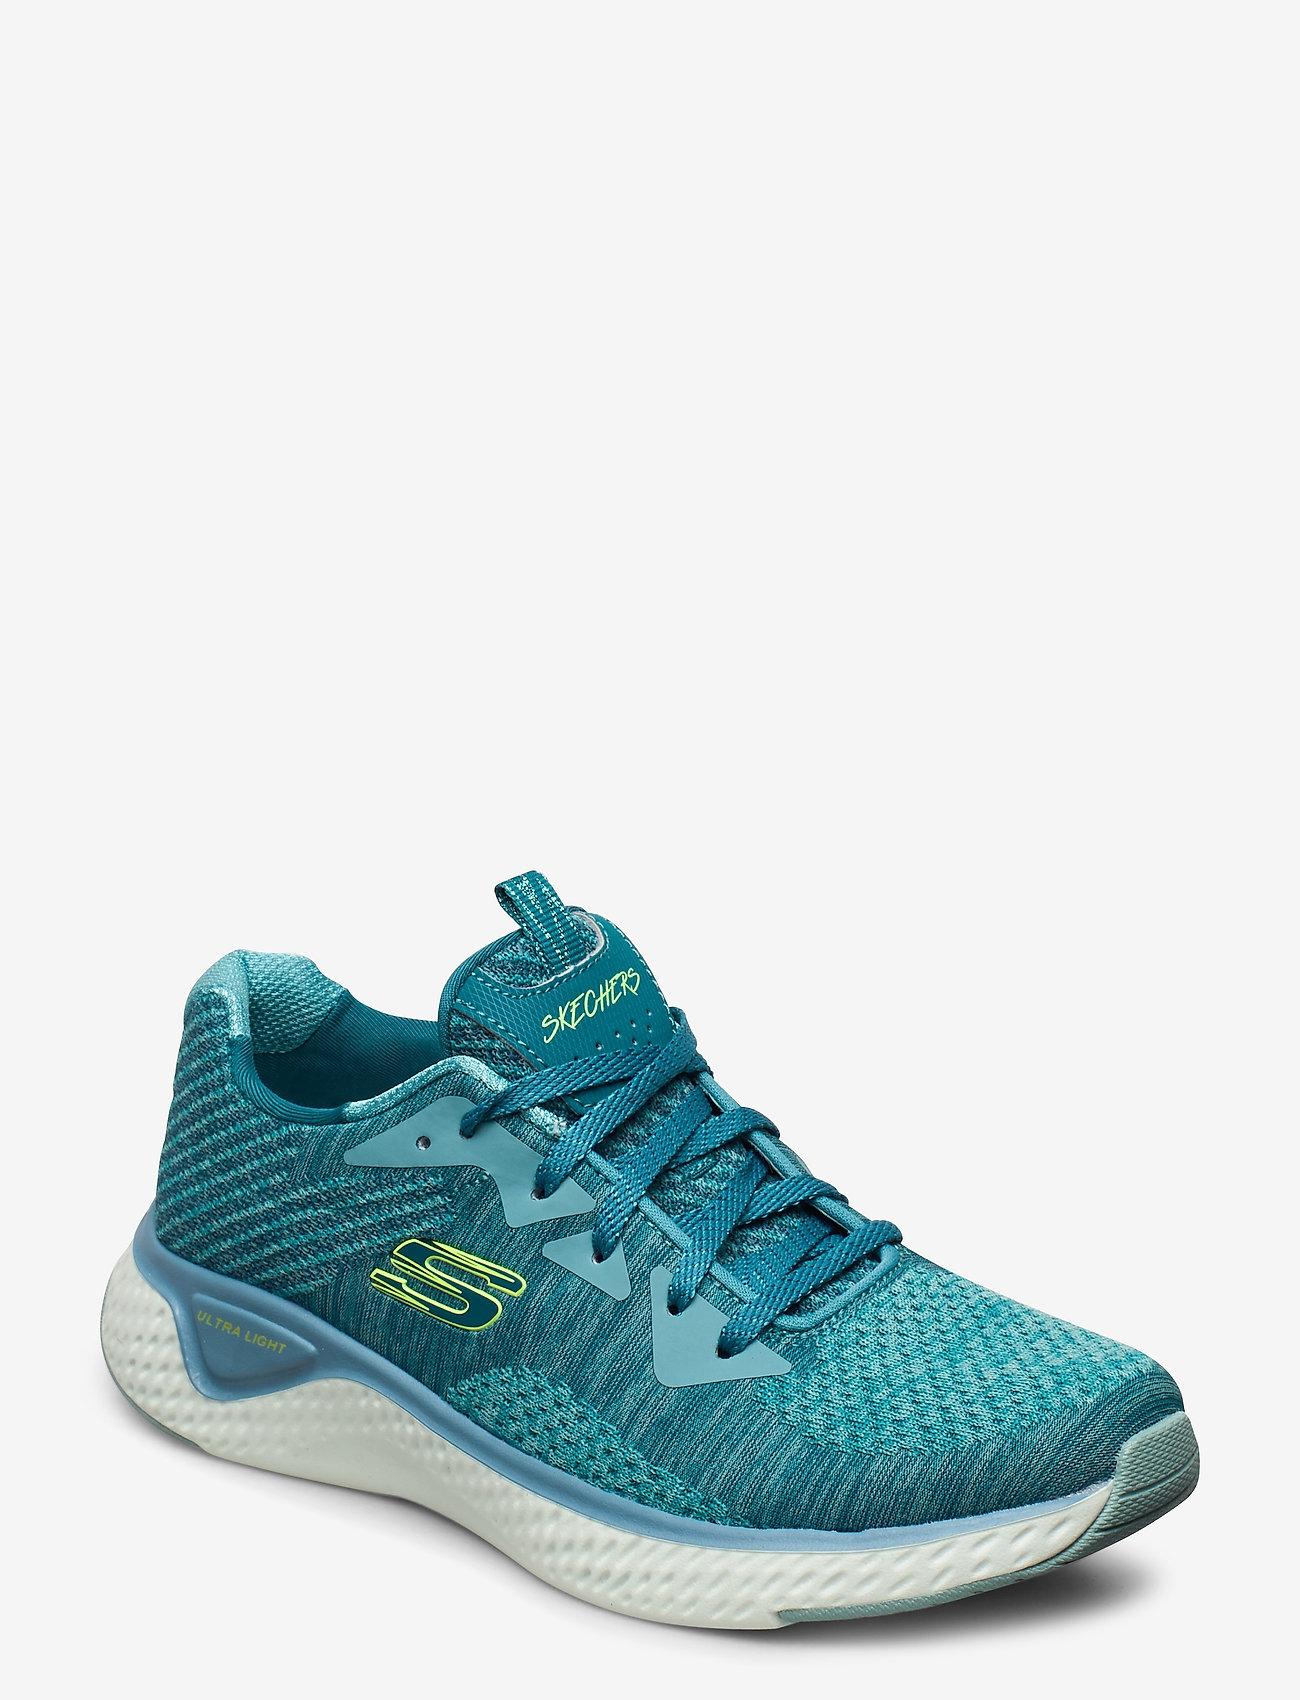 Skechers - Womens Solar Fuse - Brisk Escape - låga sneakers - blu blue - 0